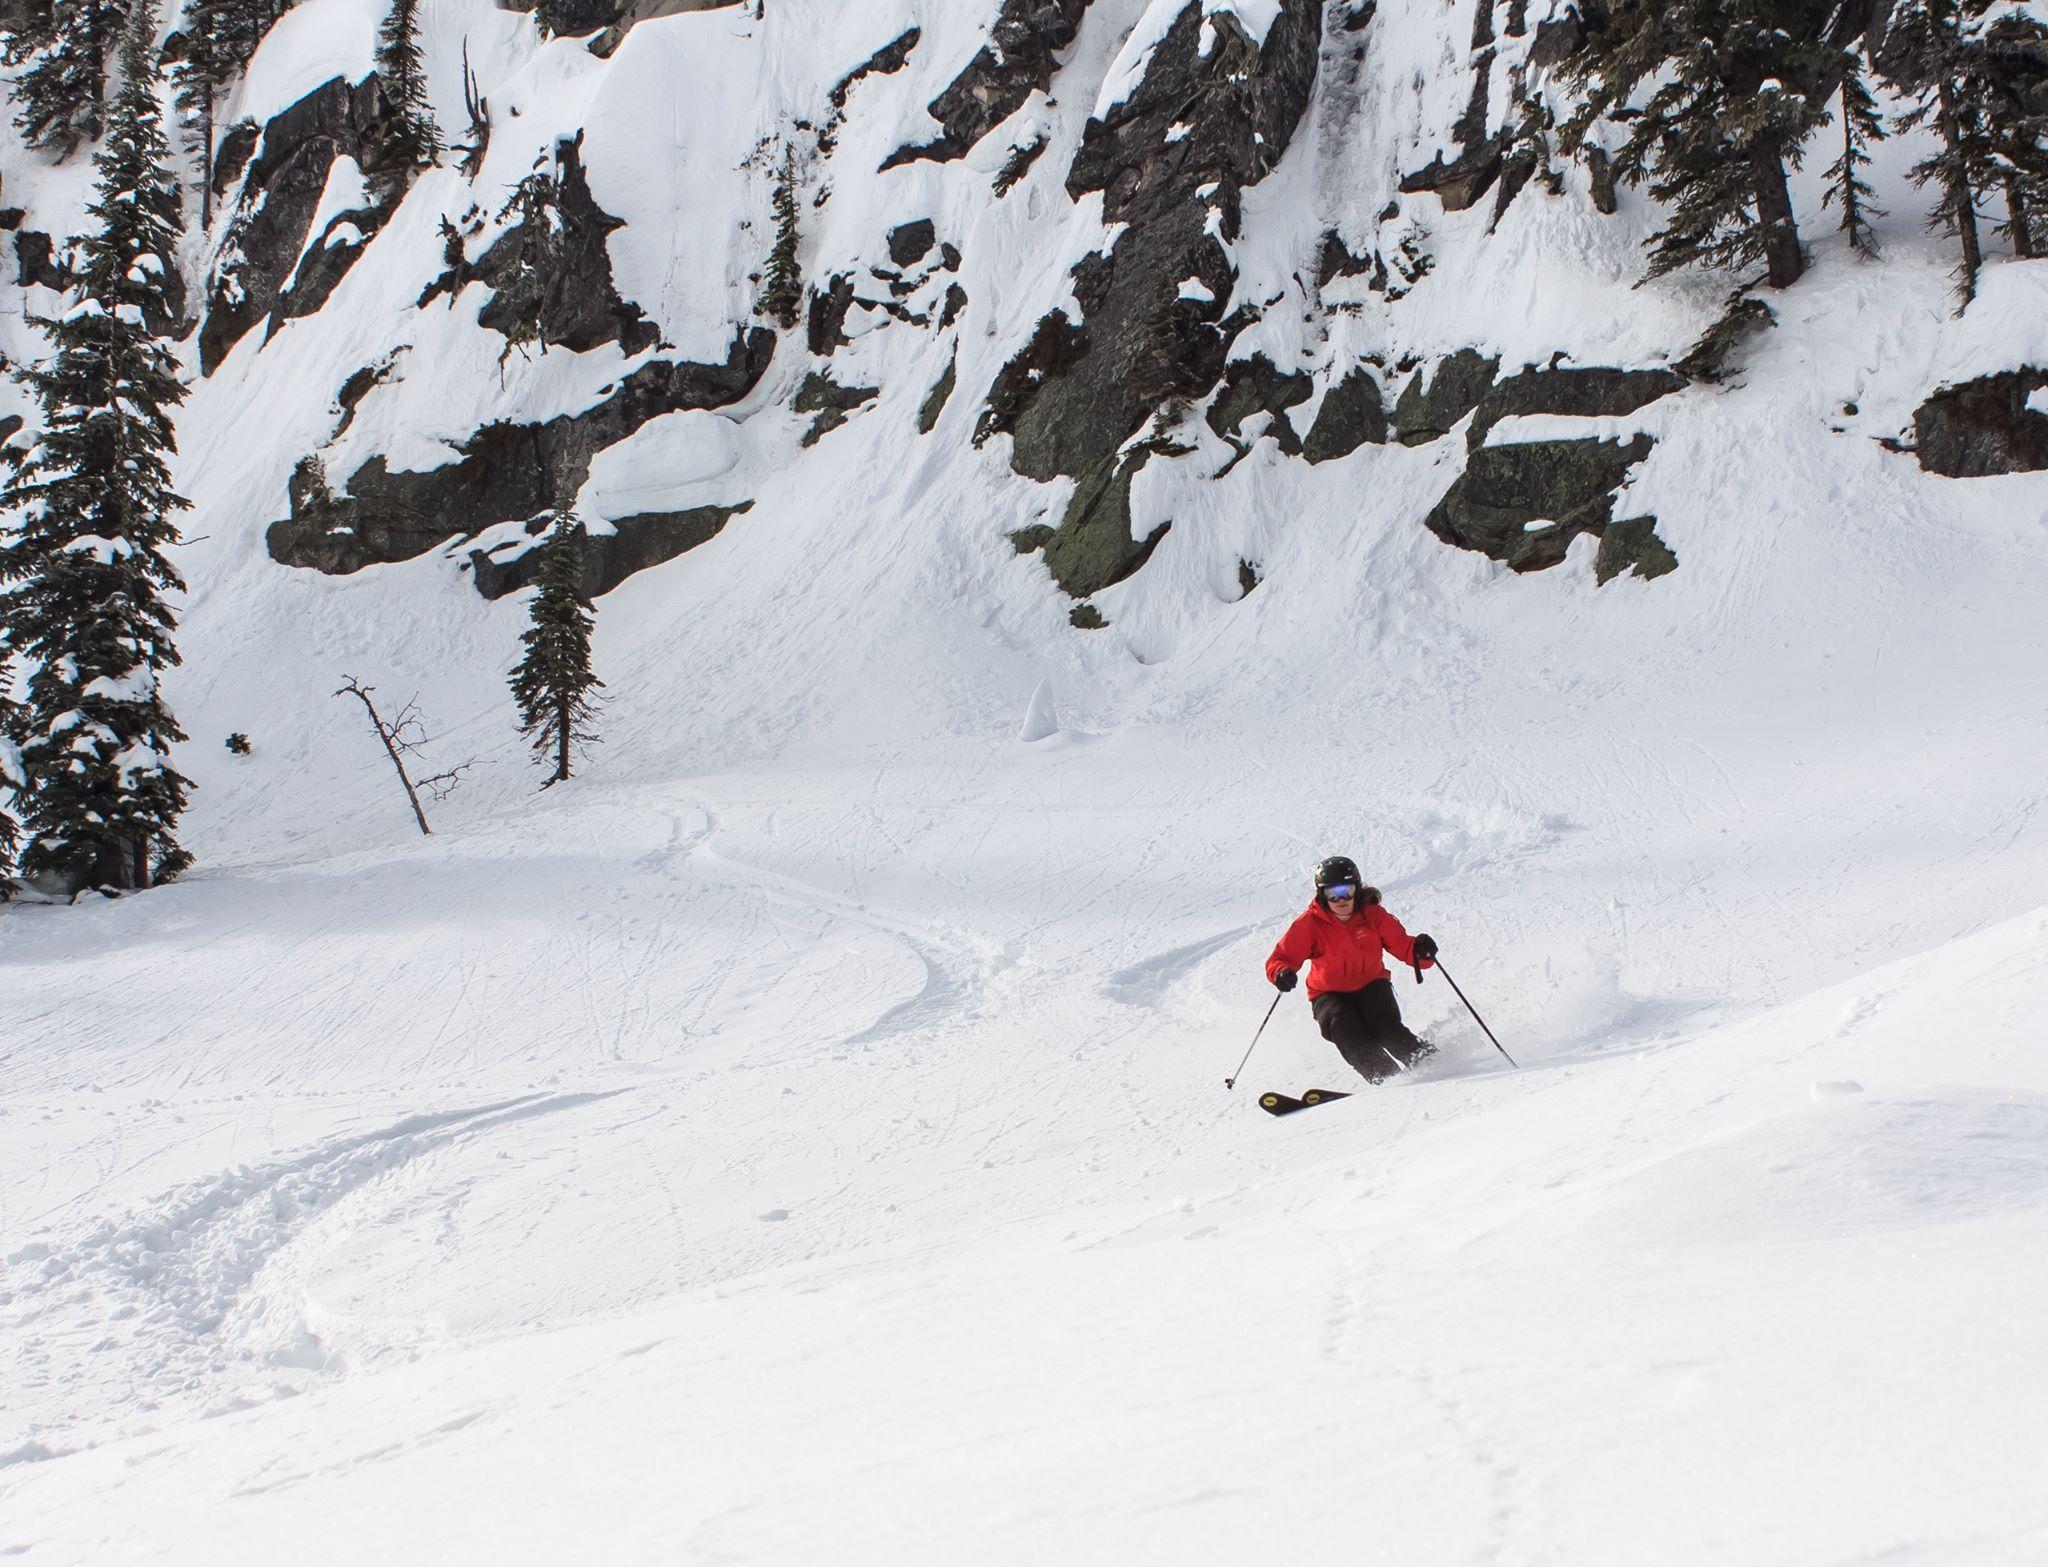 Fresh powder turns at Whitewater Ski Resort in Nelson. Photo: Gina Bégin